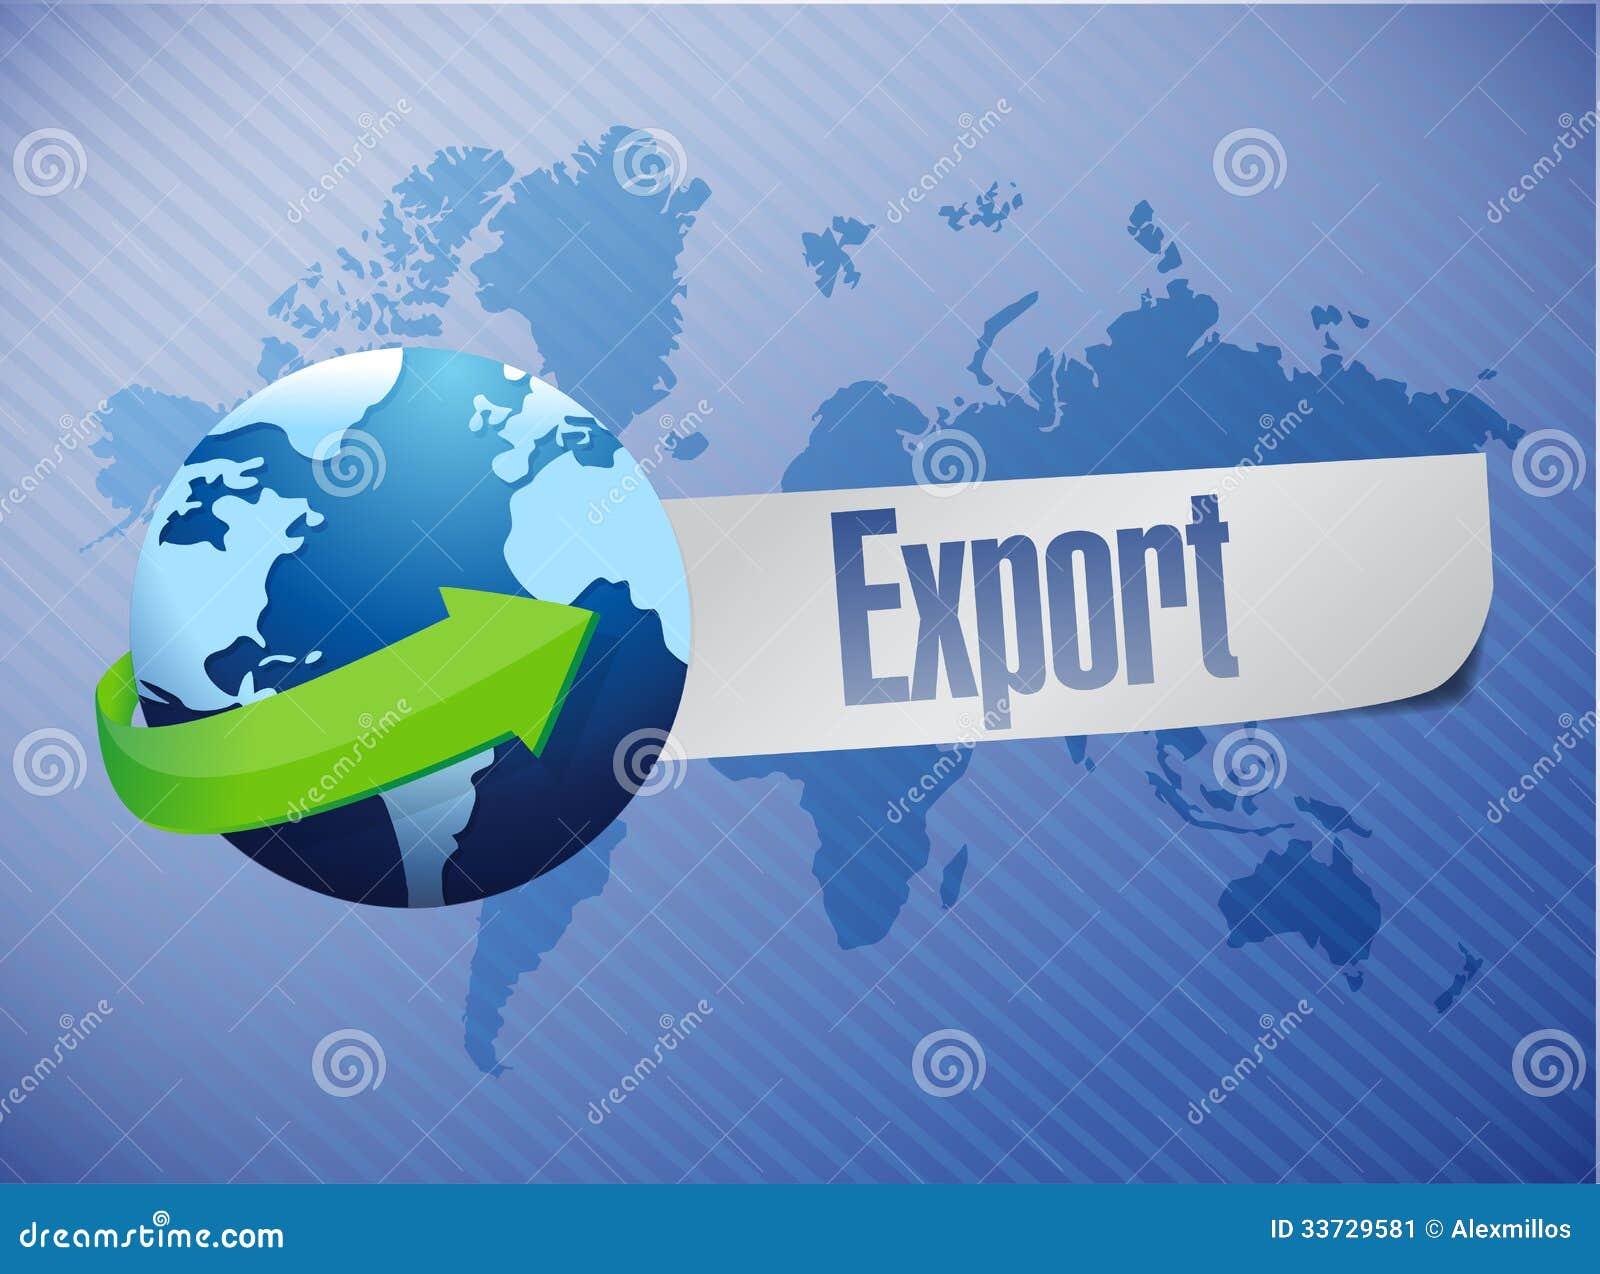 Export world map illustration design stock illustration export world map illustration design gumiabroncs Gallery